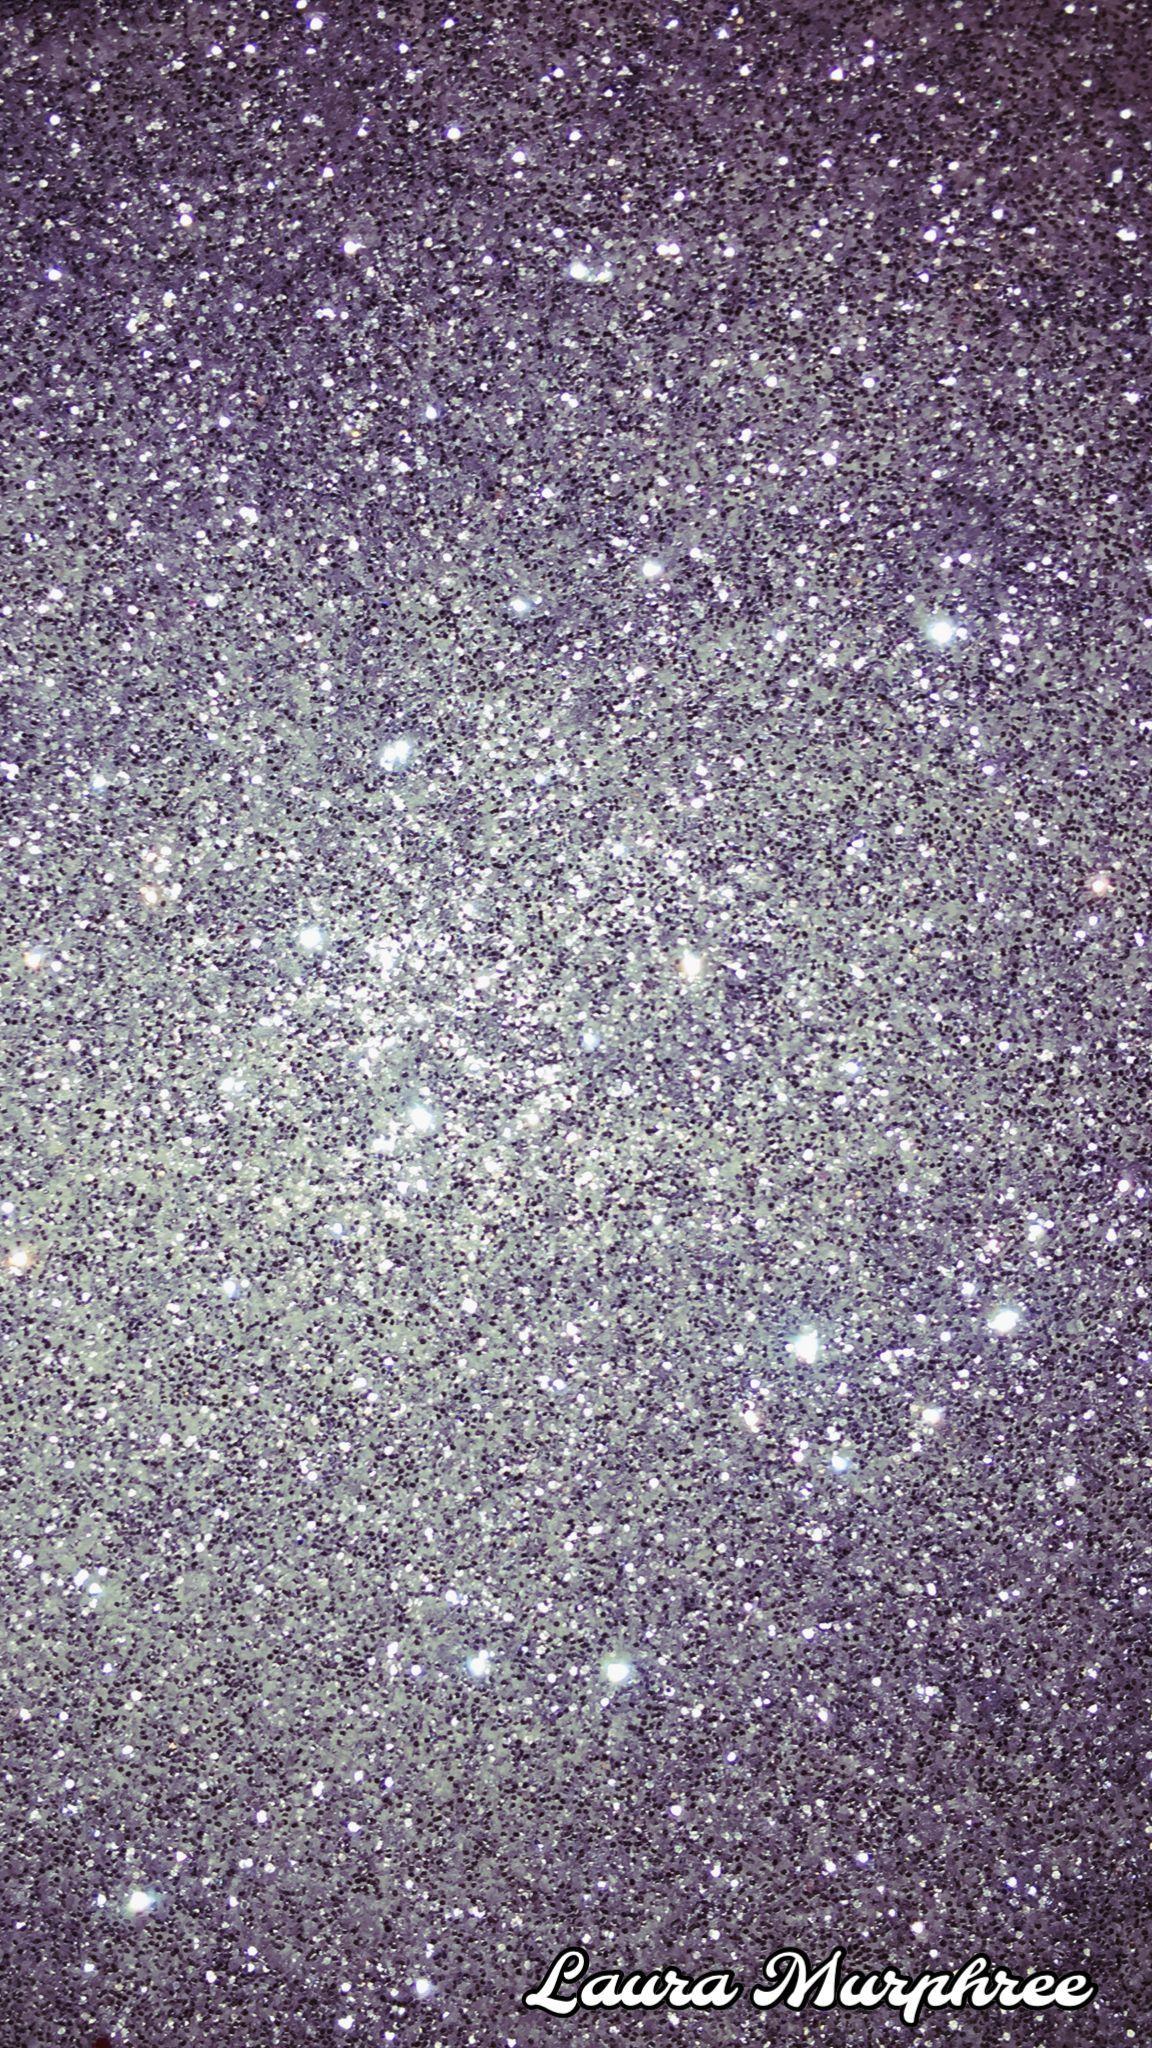 Glitter Phone Wallpaper Sparkle Backgrounds Sparkling Glittery